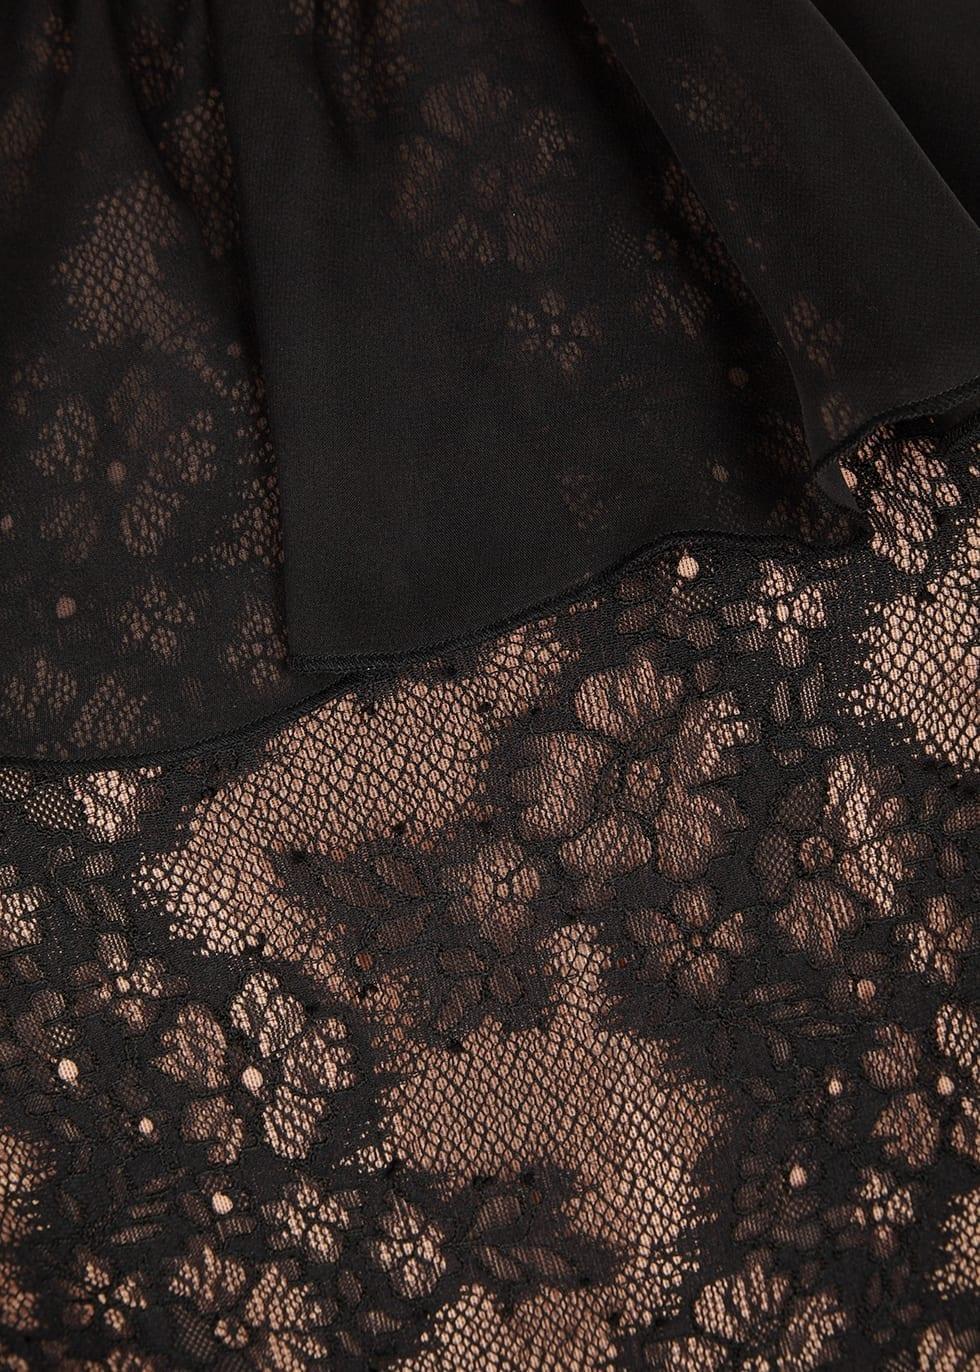 THREE FLOOR Ruffaella Ruffle Trimmed Lace Black Dress